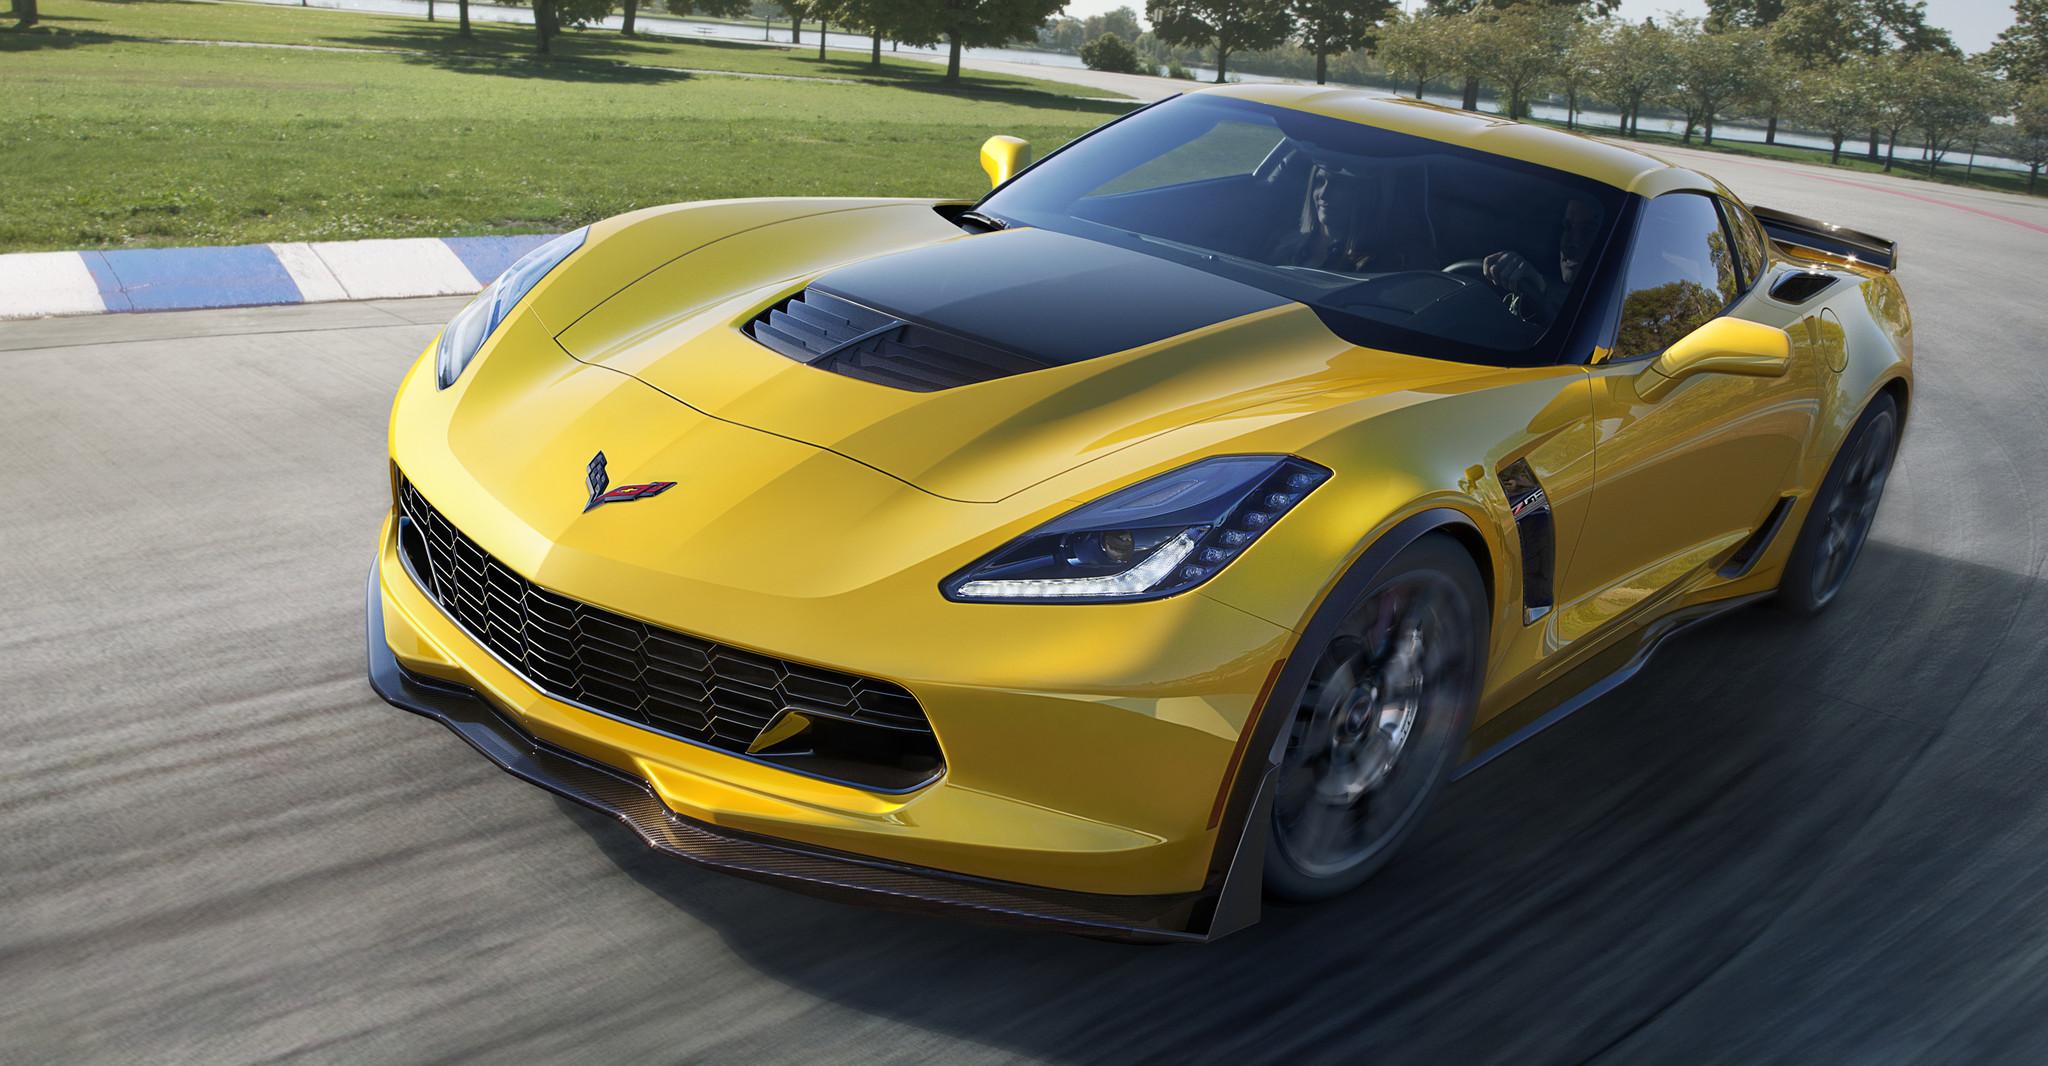 Chevrolet corvette z06 price will match its massive horsepower la times